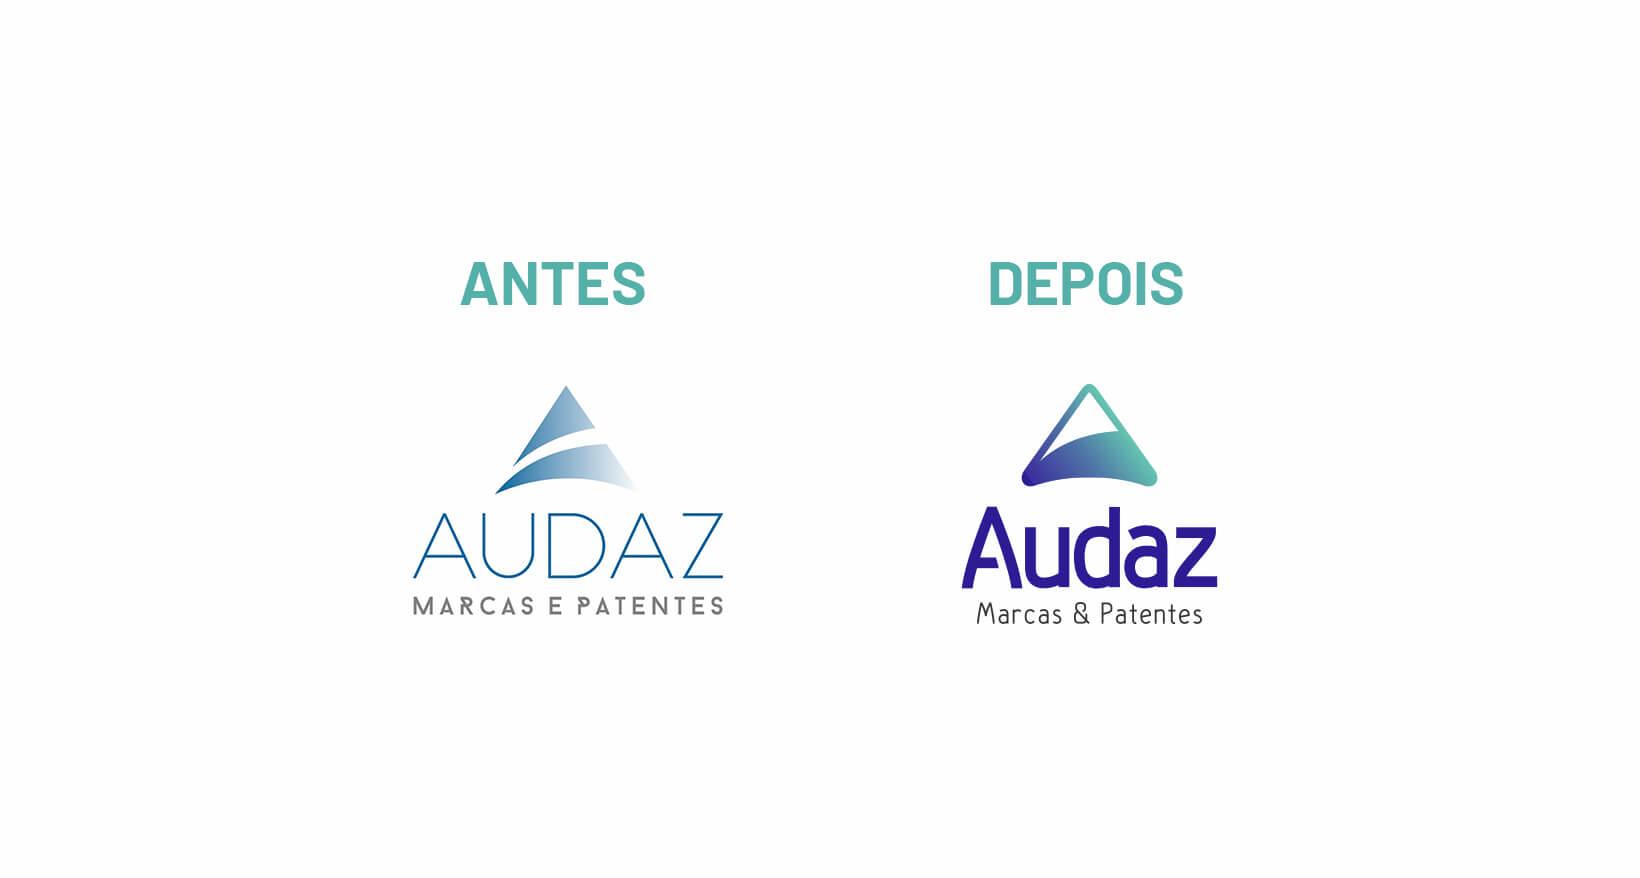 Audaz · Marcas & Patentes